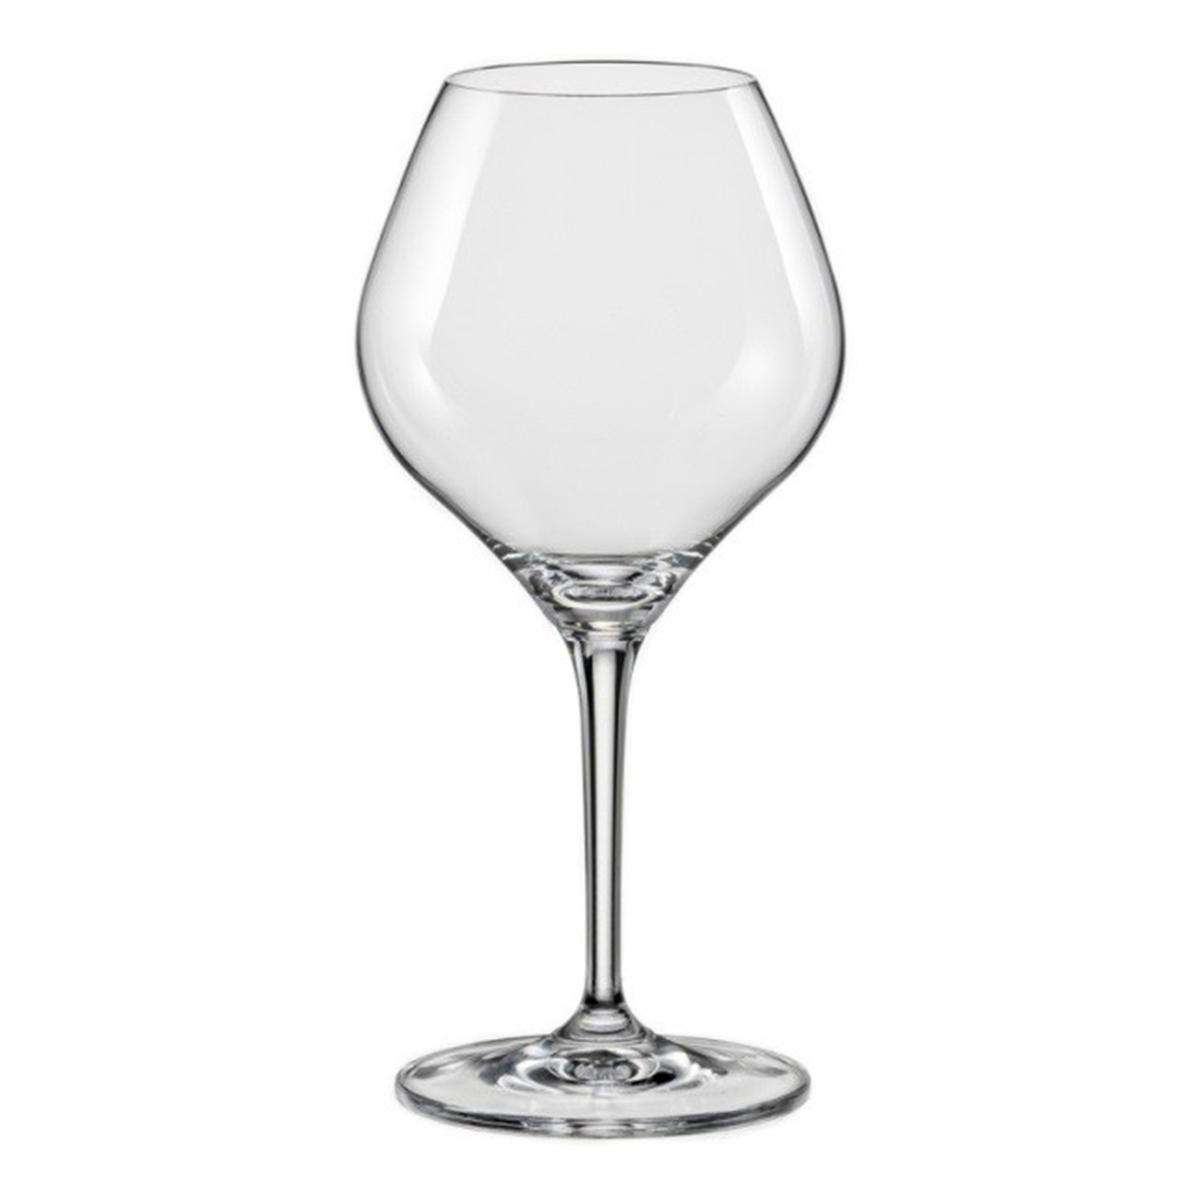 Набор бокалов для вина Bohemia Crystal Аморосо, 350 мл, 2 шт набор бокалов crystalex ангела оптика отводка зол 6шт 400мл бренди стекло